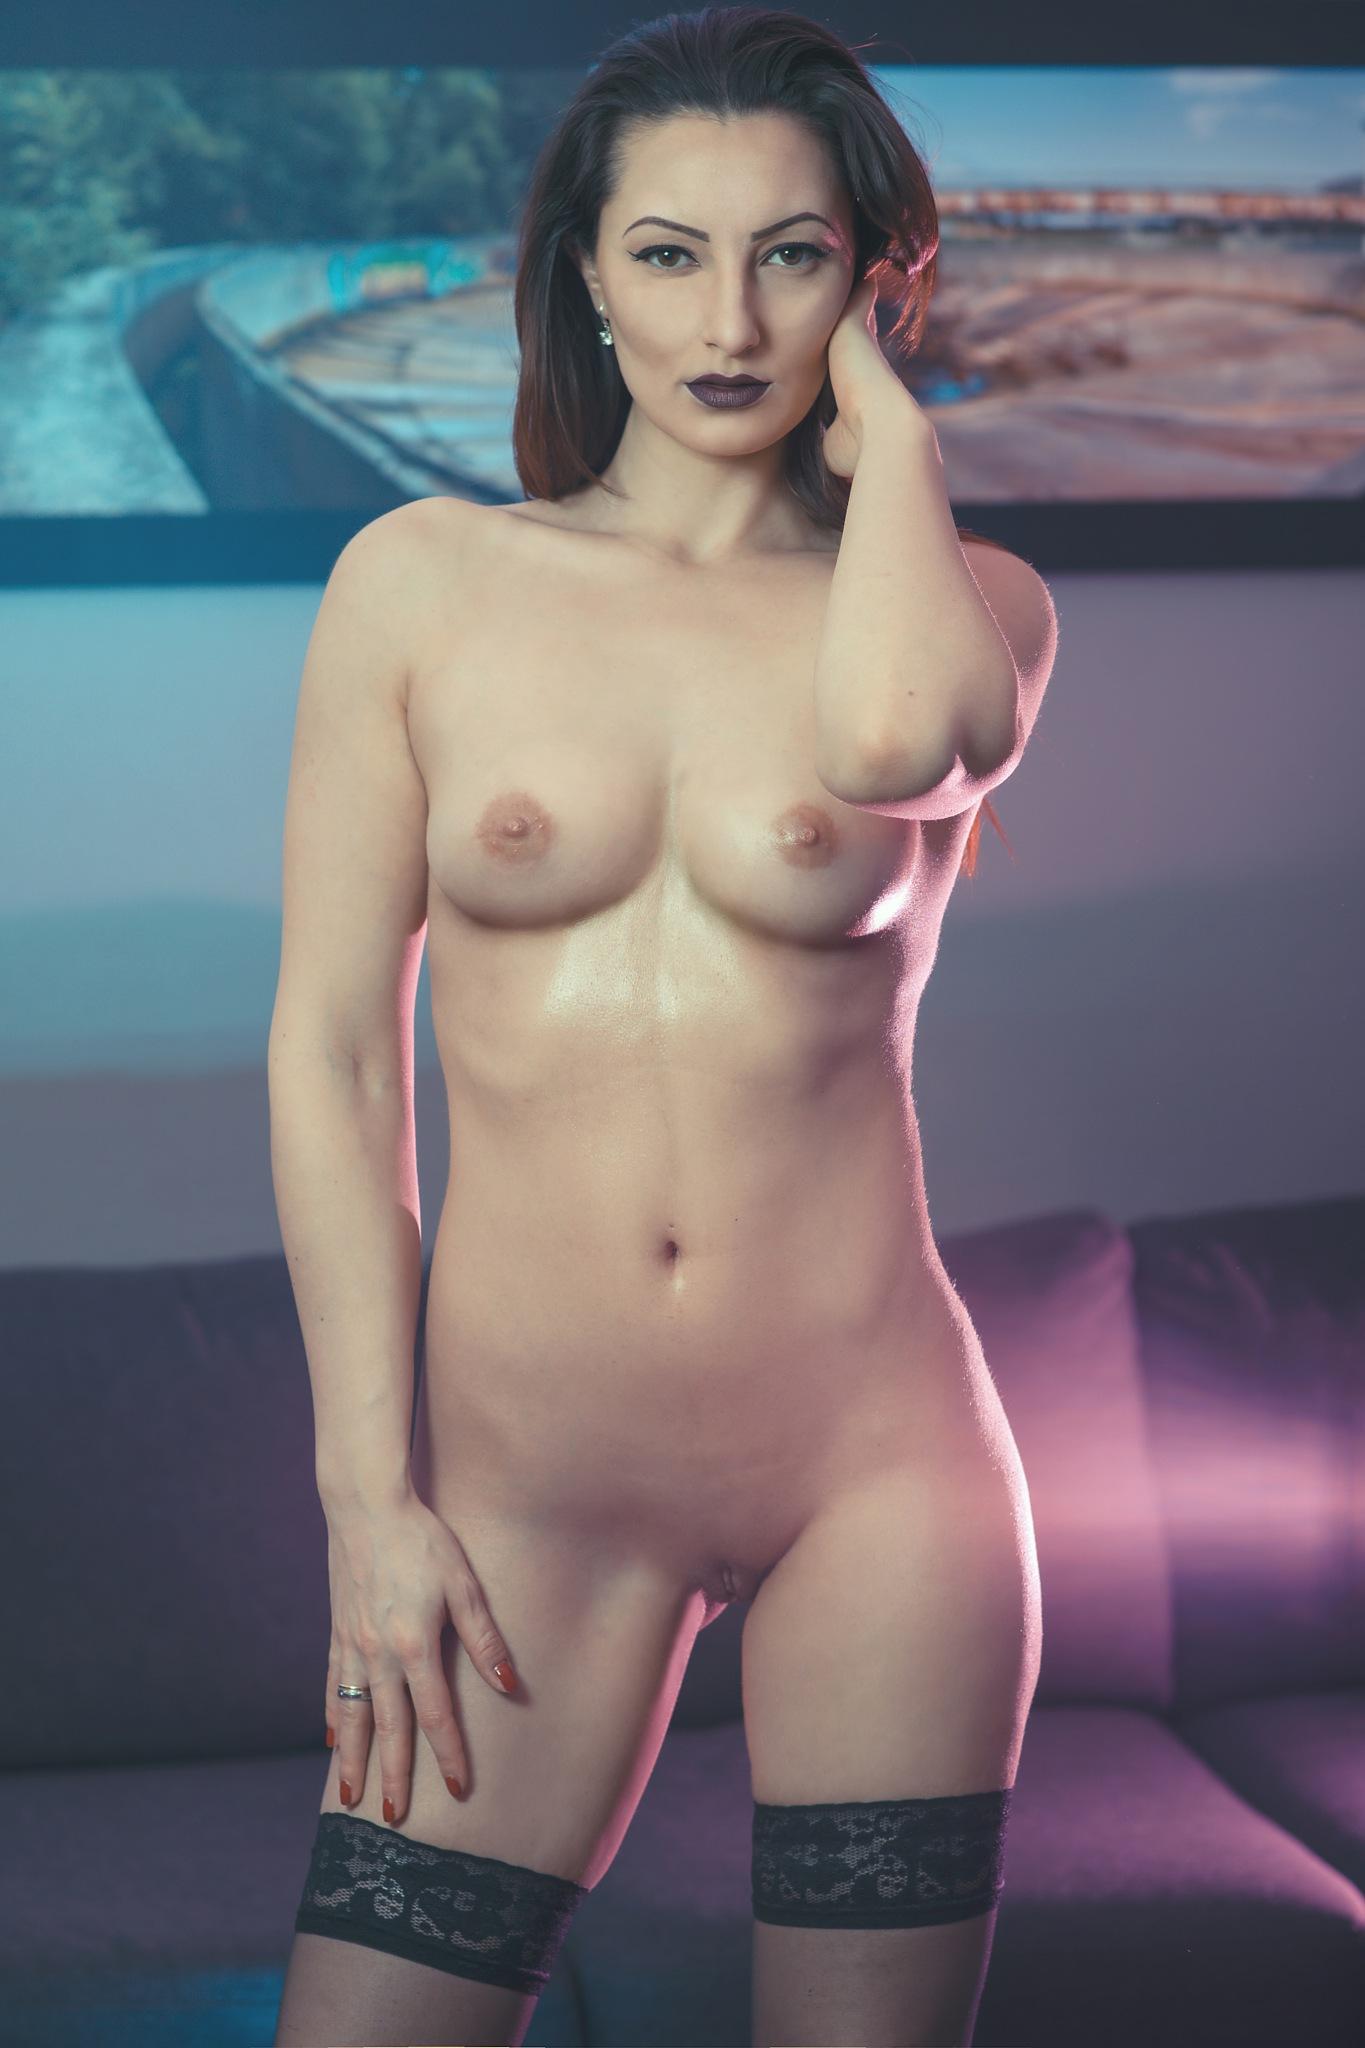 Nude by Ronny Grytbakk